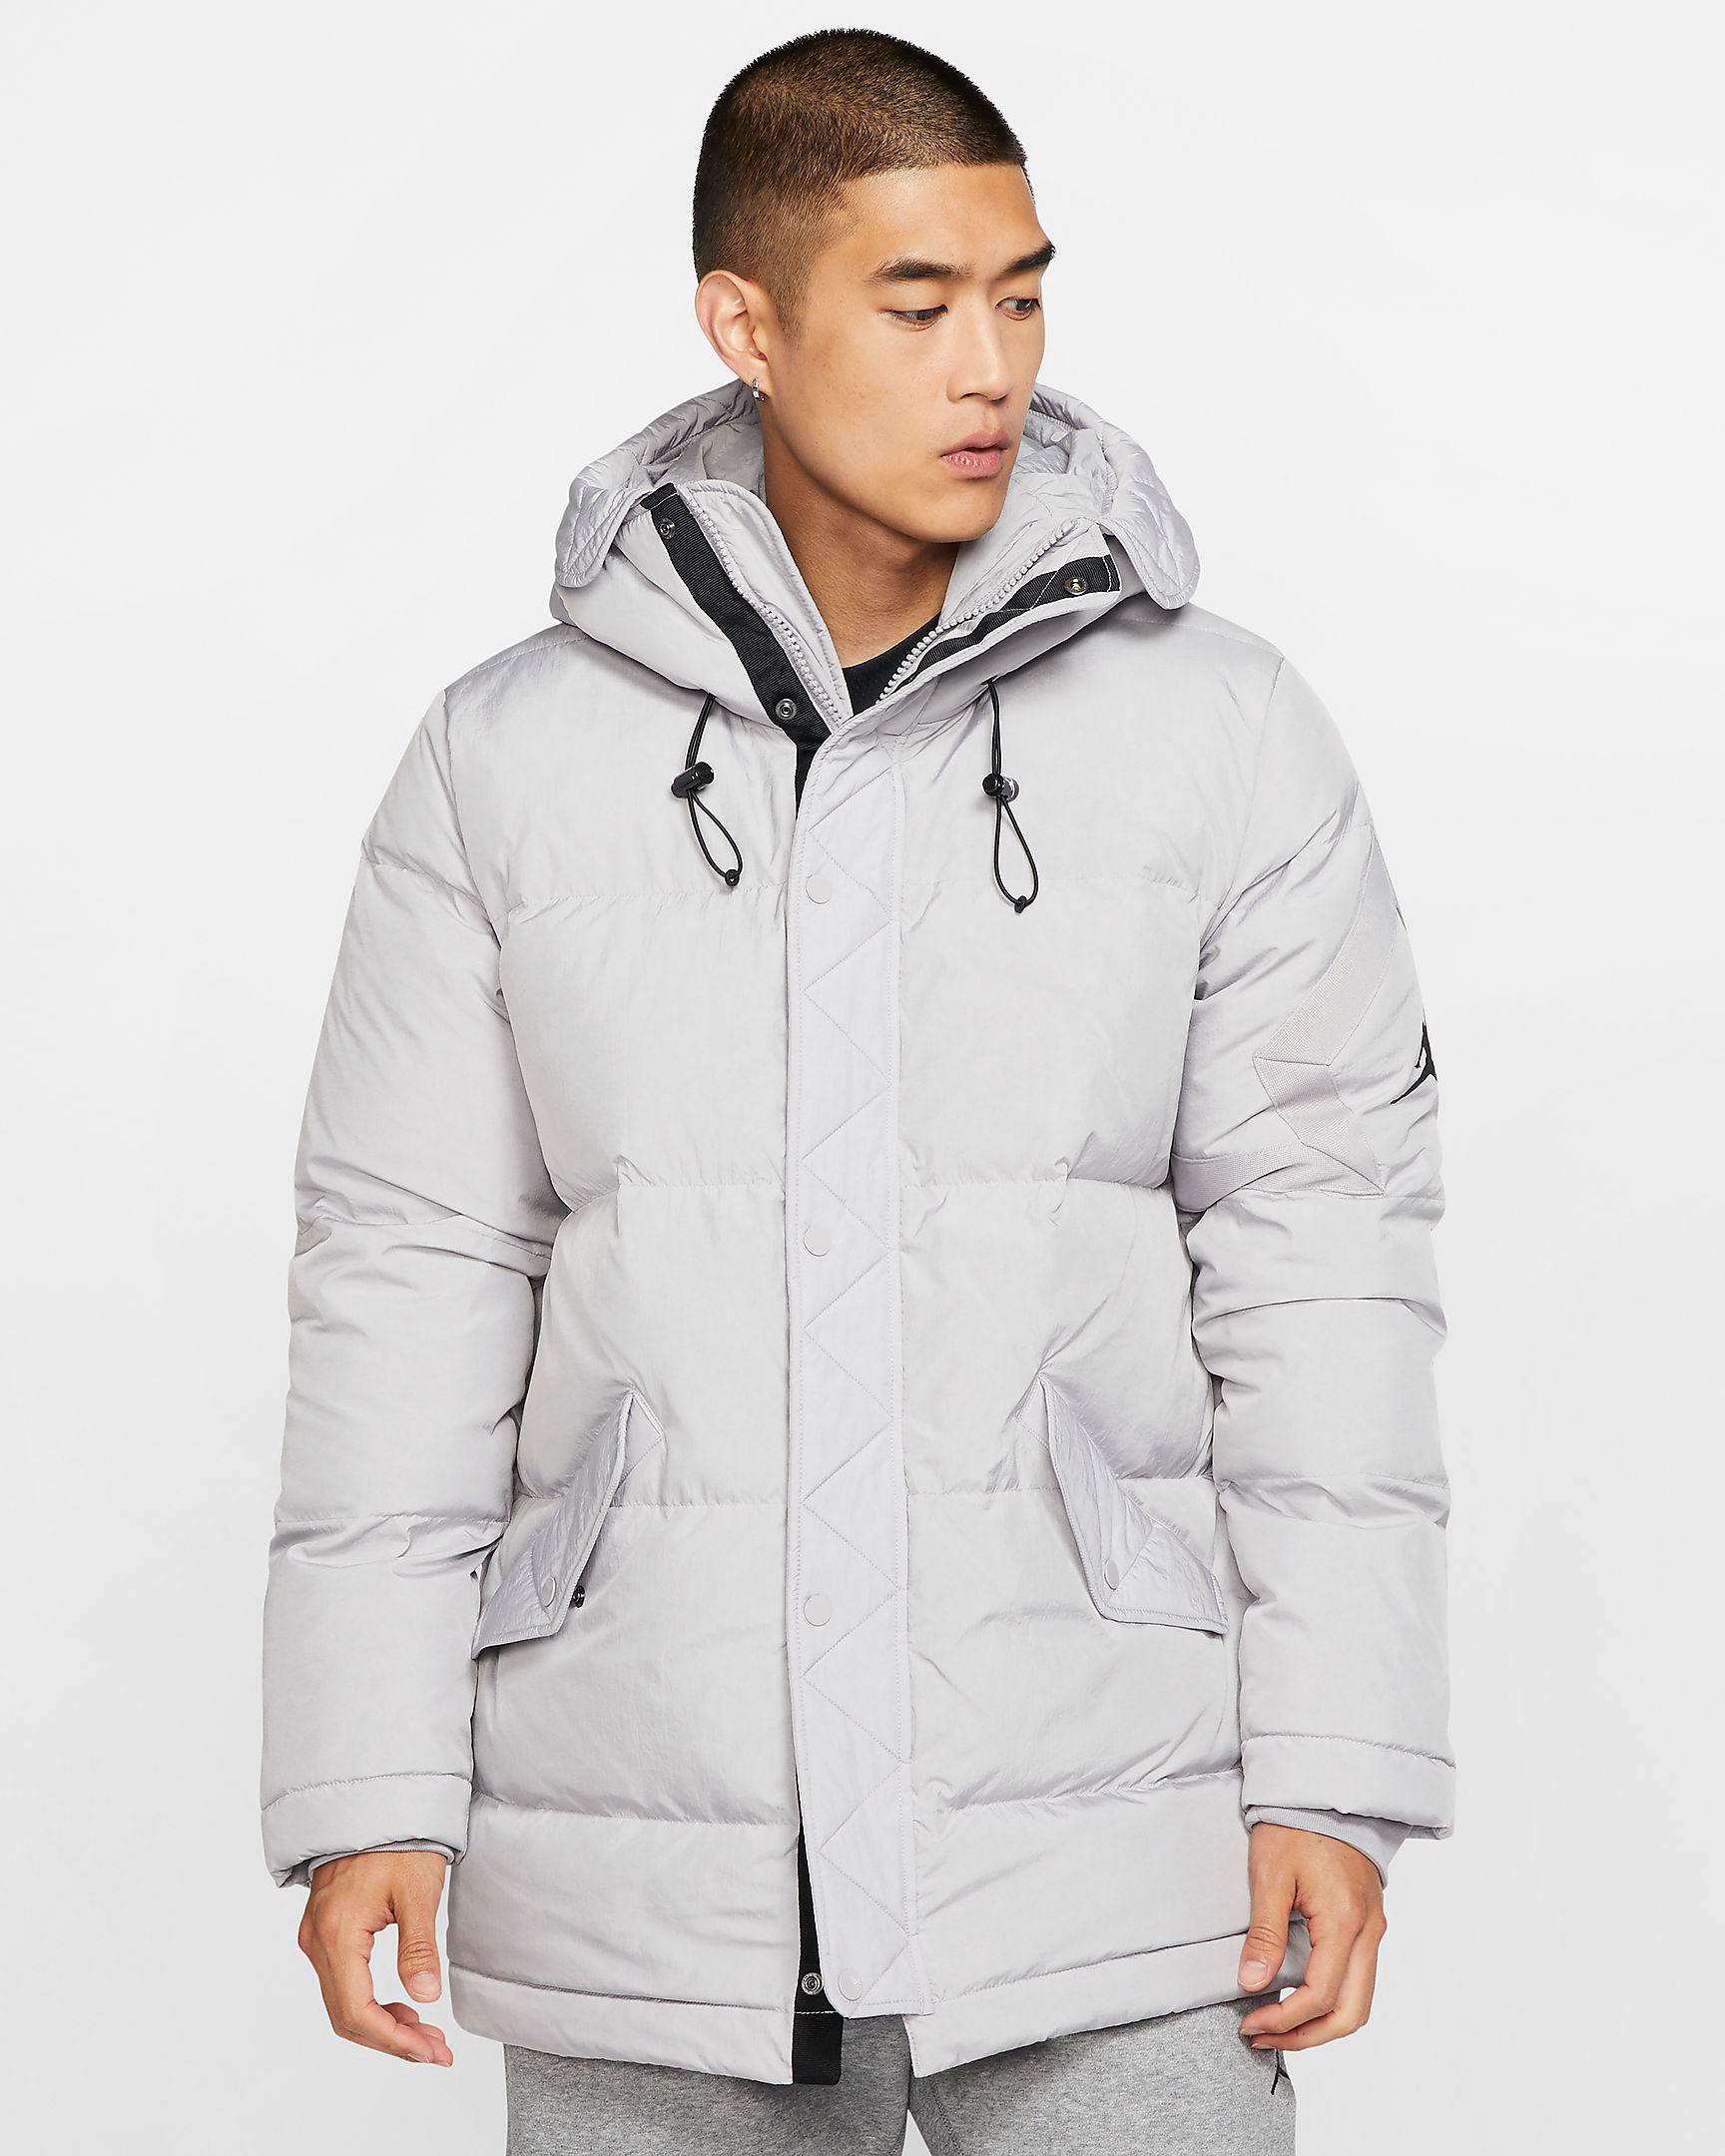 jordan-wings-down-parka-jacket-grey-1